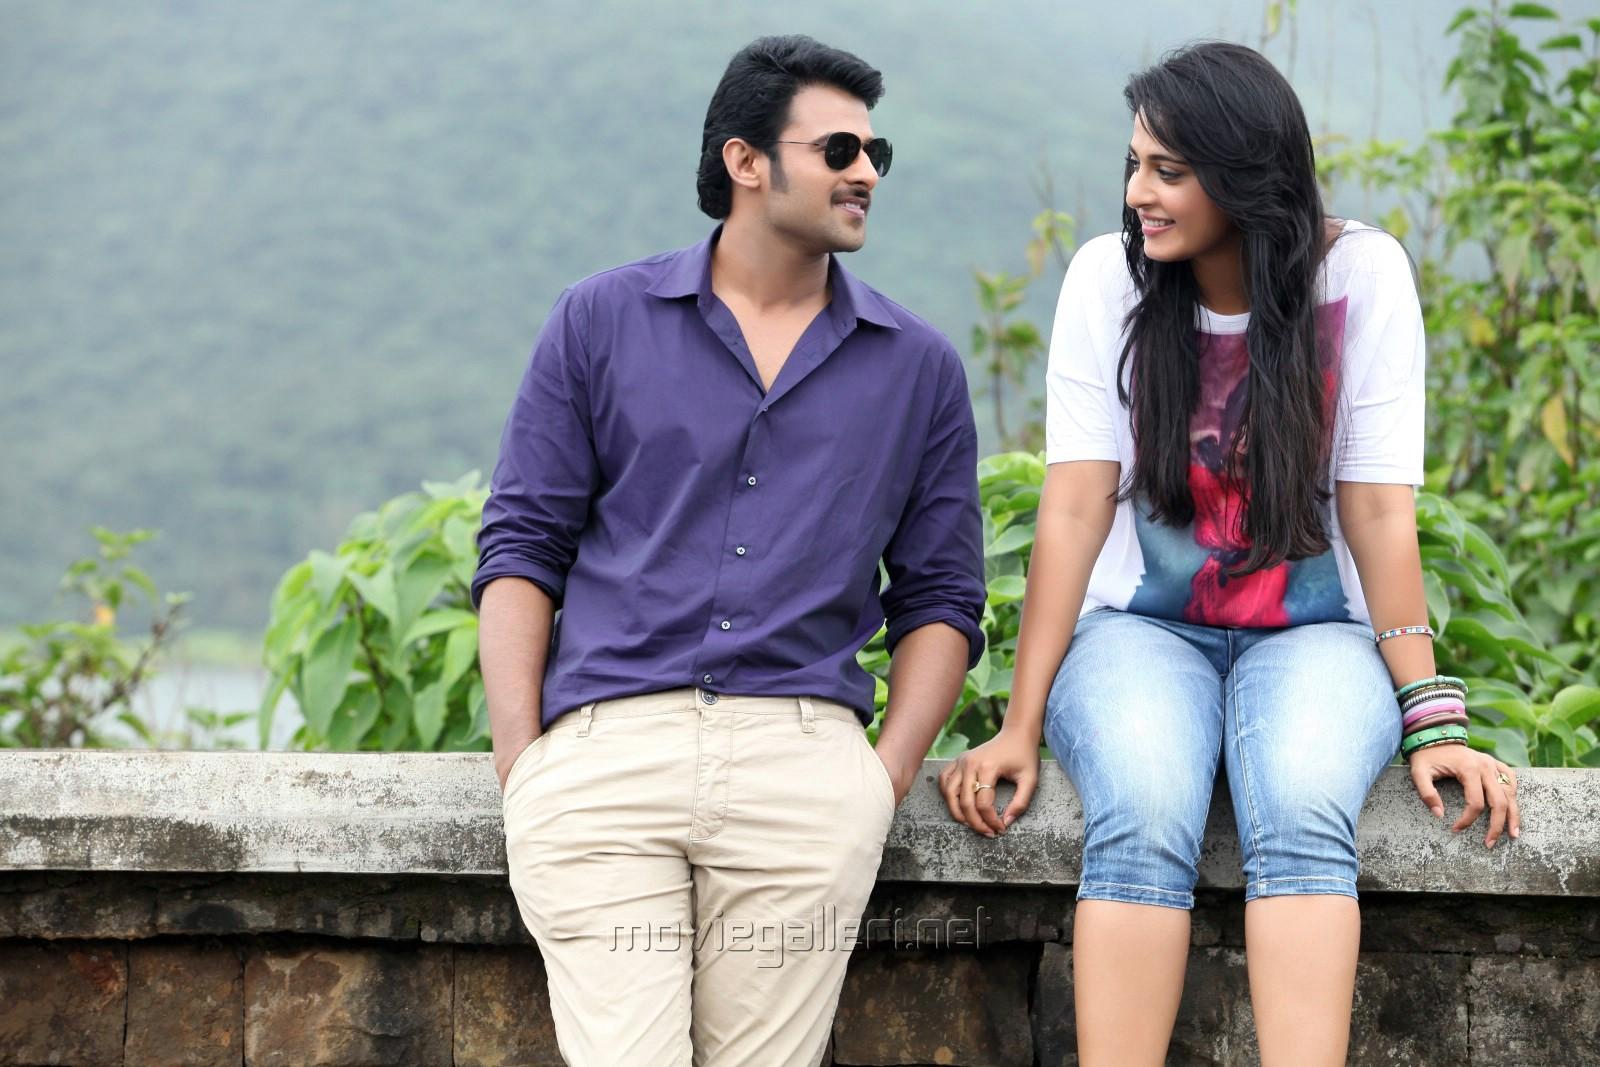 Prabhas Mirchi Telugu Movie 2013 Wallpapers Hd: Prabhas, Anushka Shetty In Mirchi Movie